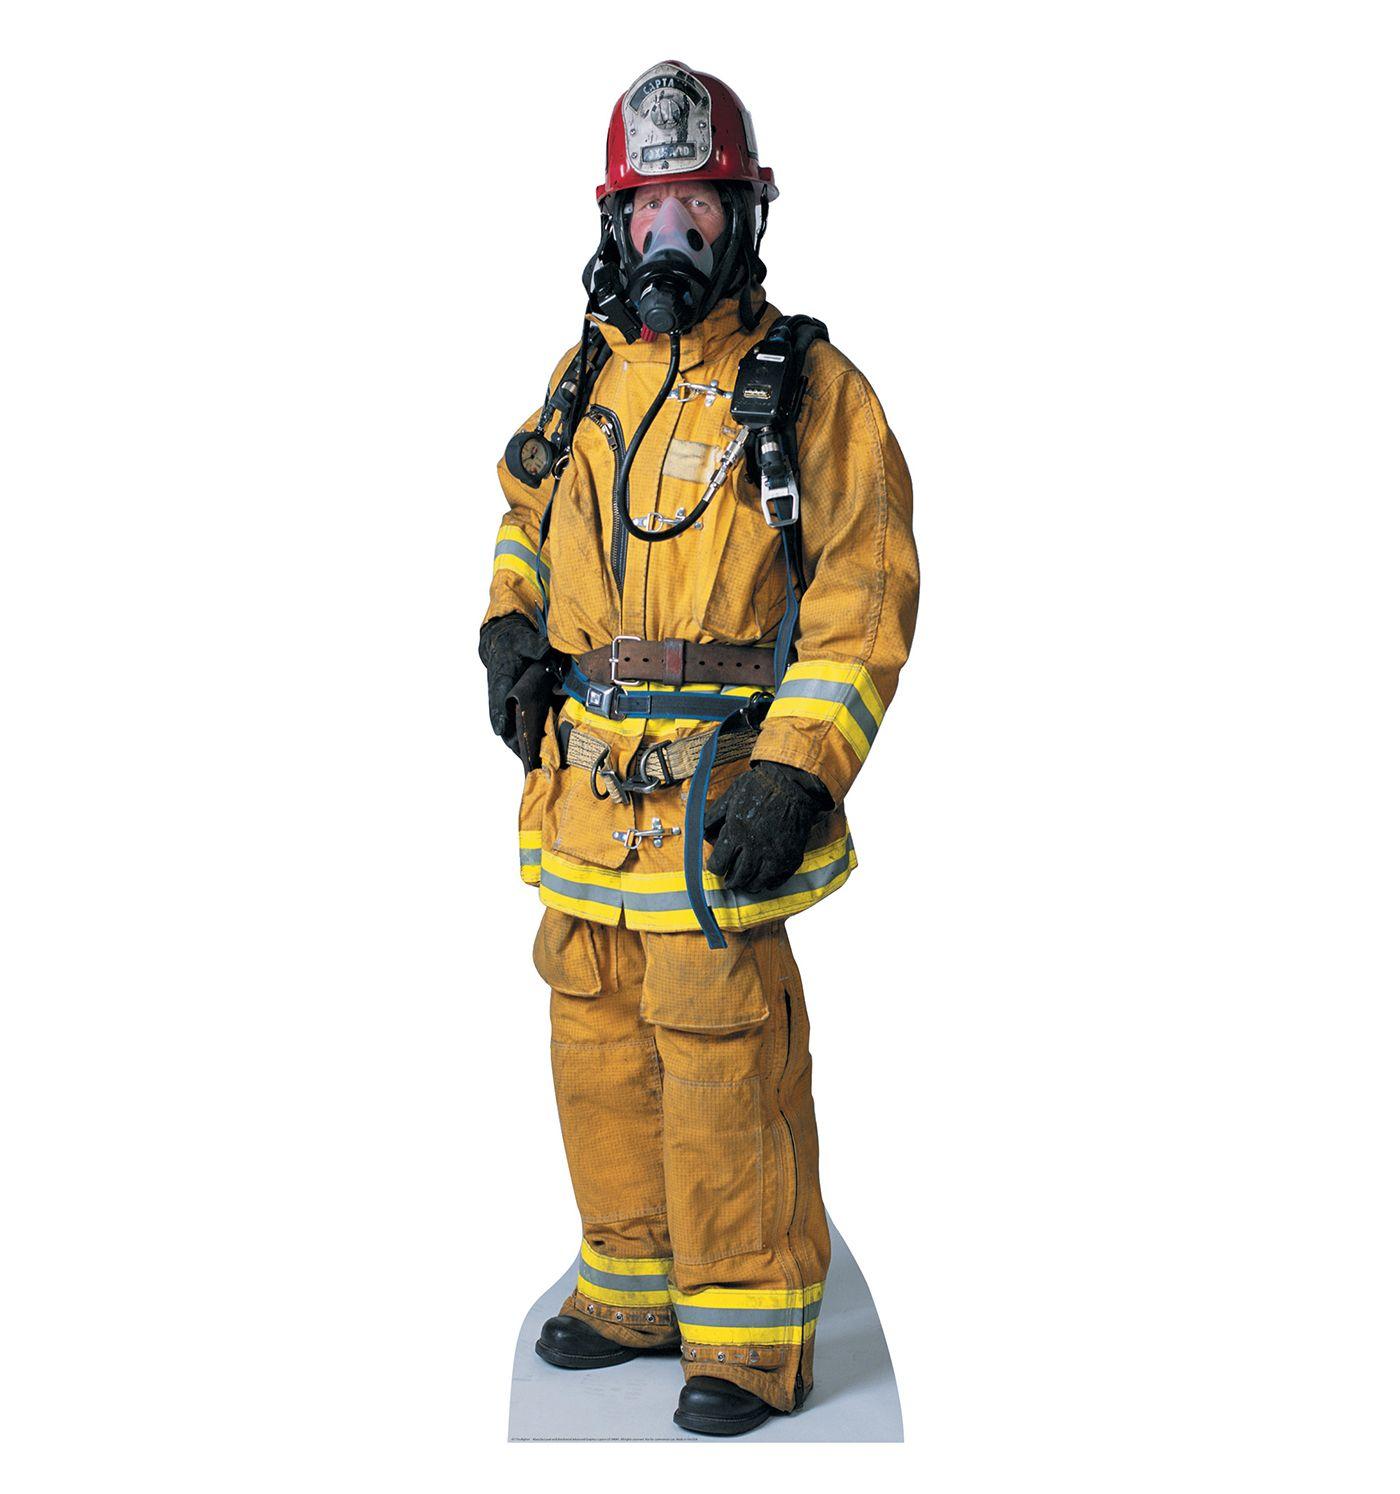 Firefighter Cardboard Cutout Advanced Graphics Firefighter Life Size Cardboard Cutouts